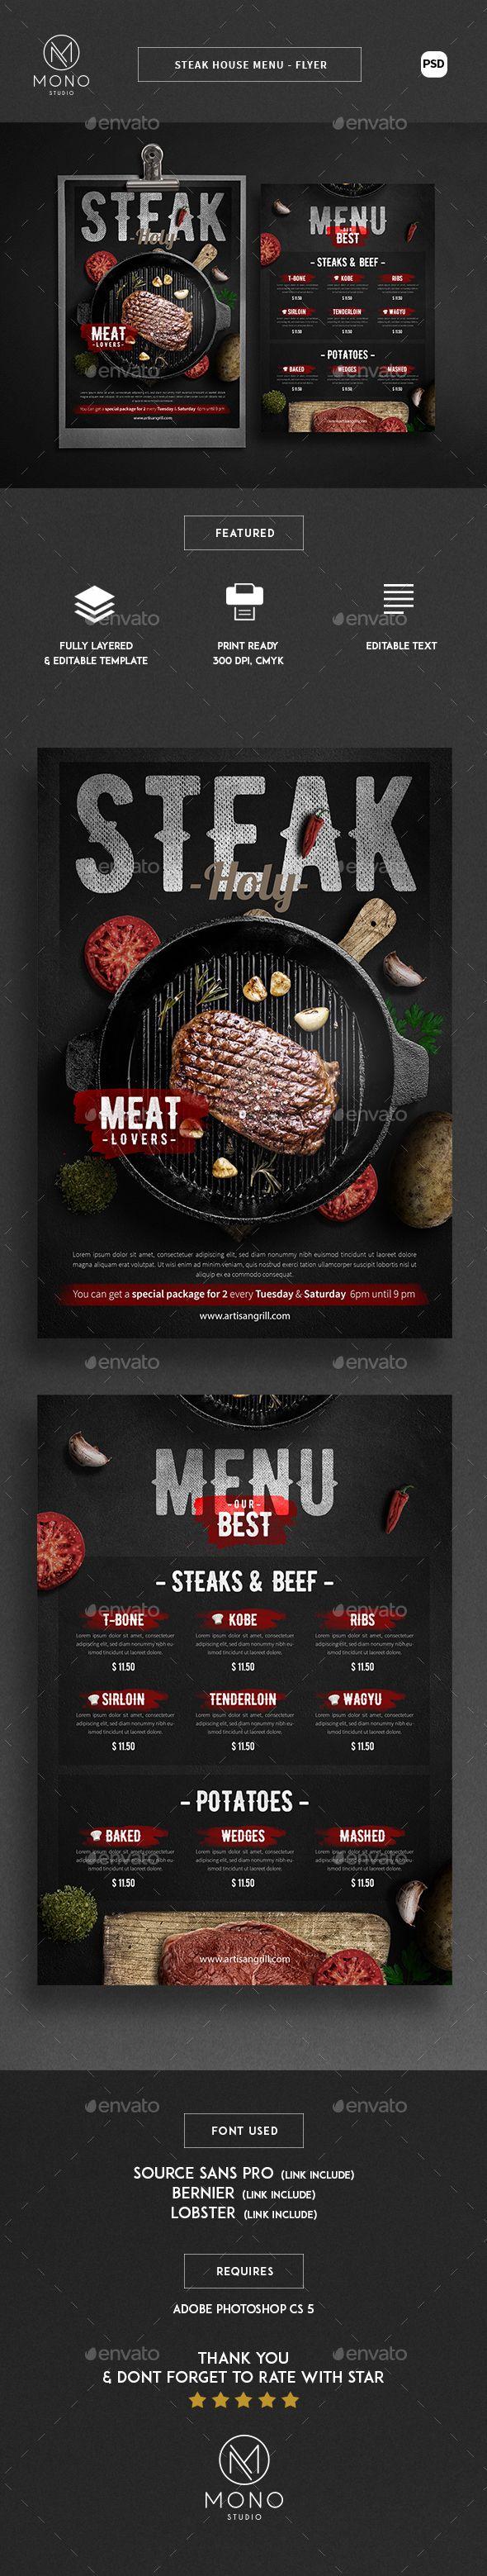 Steak House Menu - Flyer Template PSD. Download here: http://graphicriver.net/item/steak-house-menu-flyer/16587998?ref=ksioks